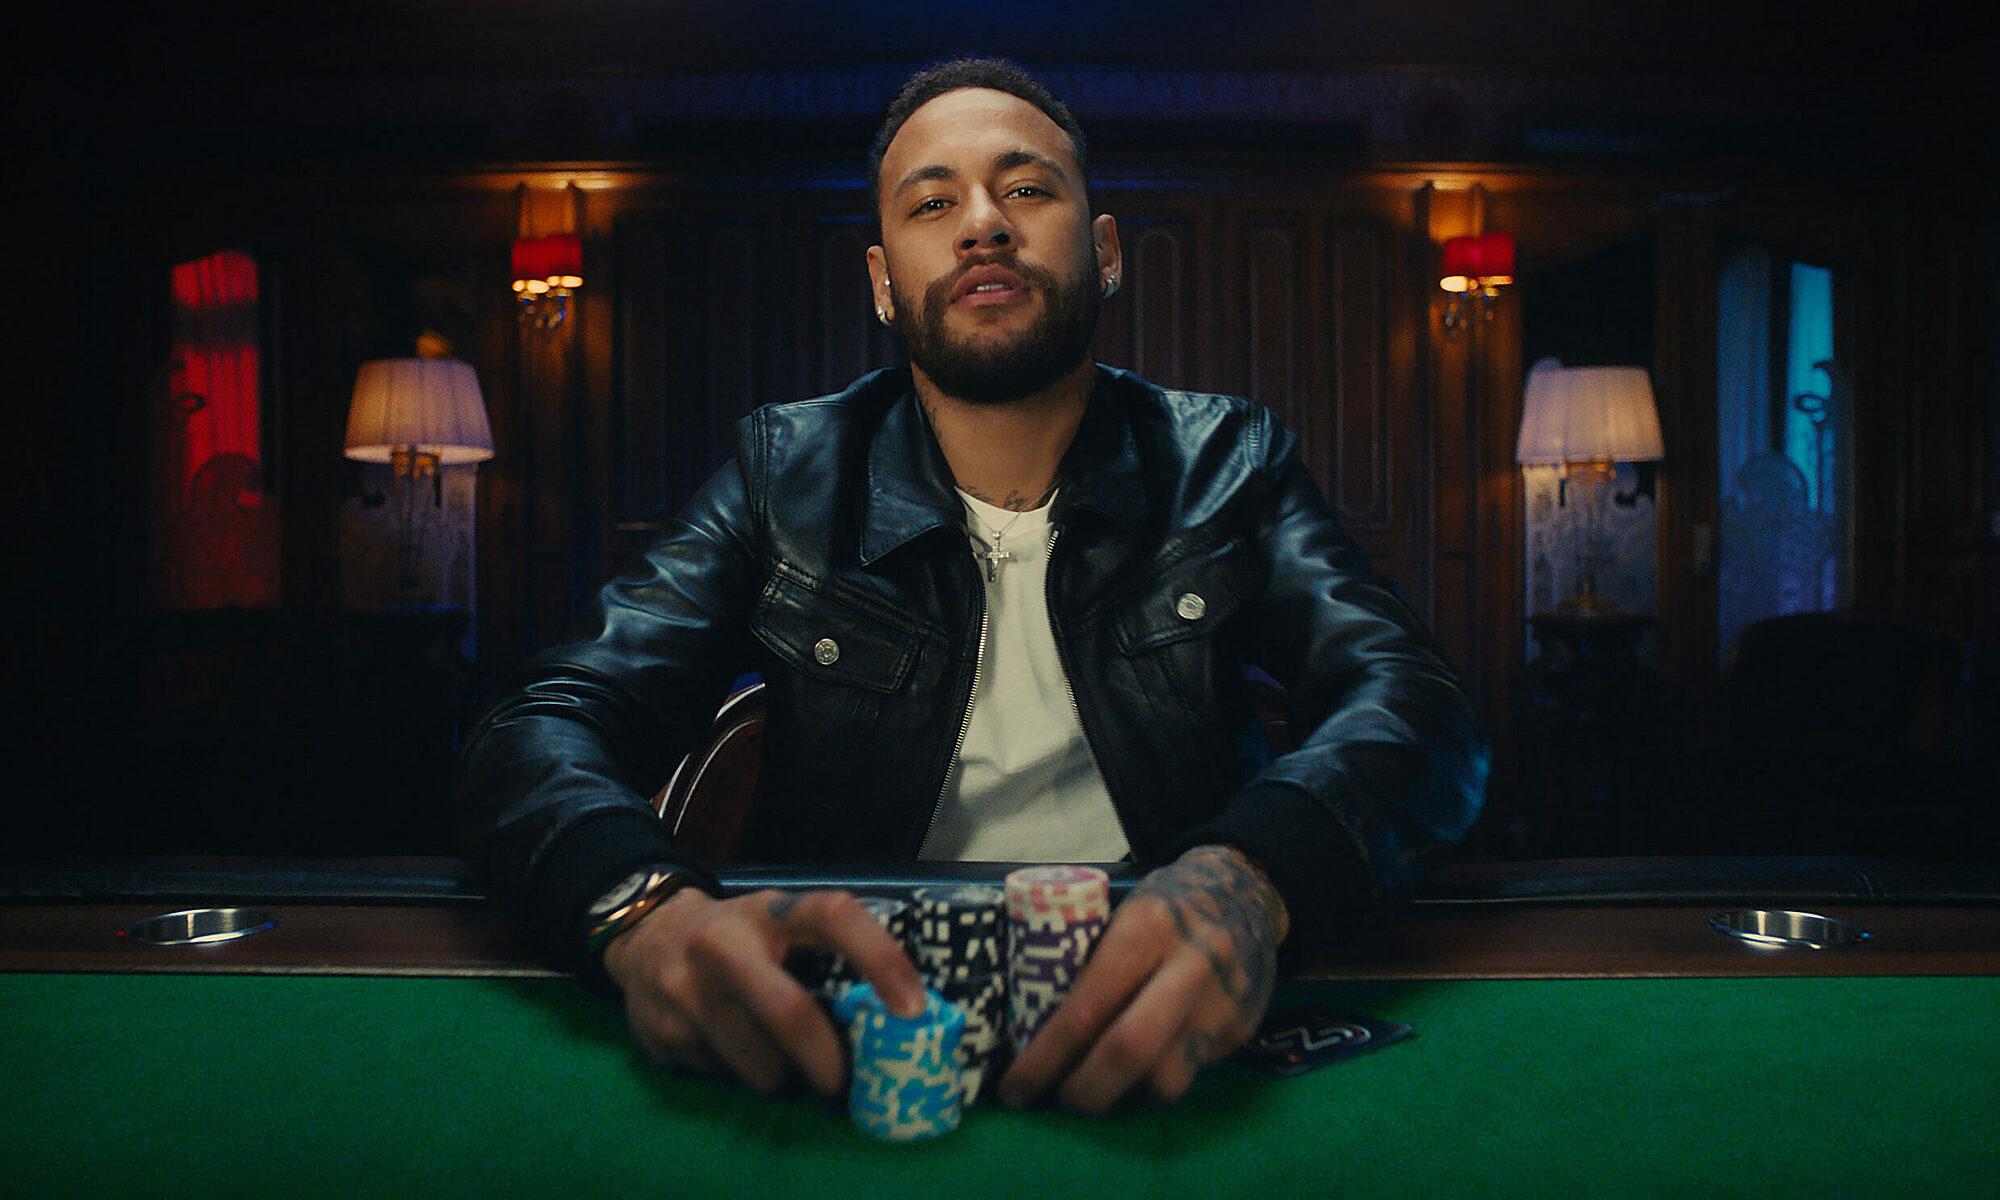 Neymar menganggap poker sebagai gairah terbesar kedua setelah sepak bola.  Foto: pokerstars.net